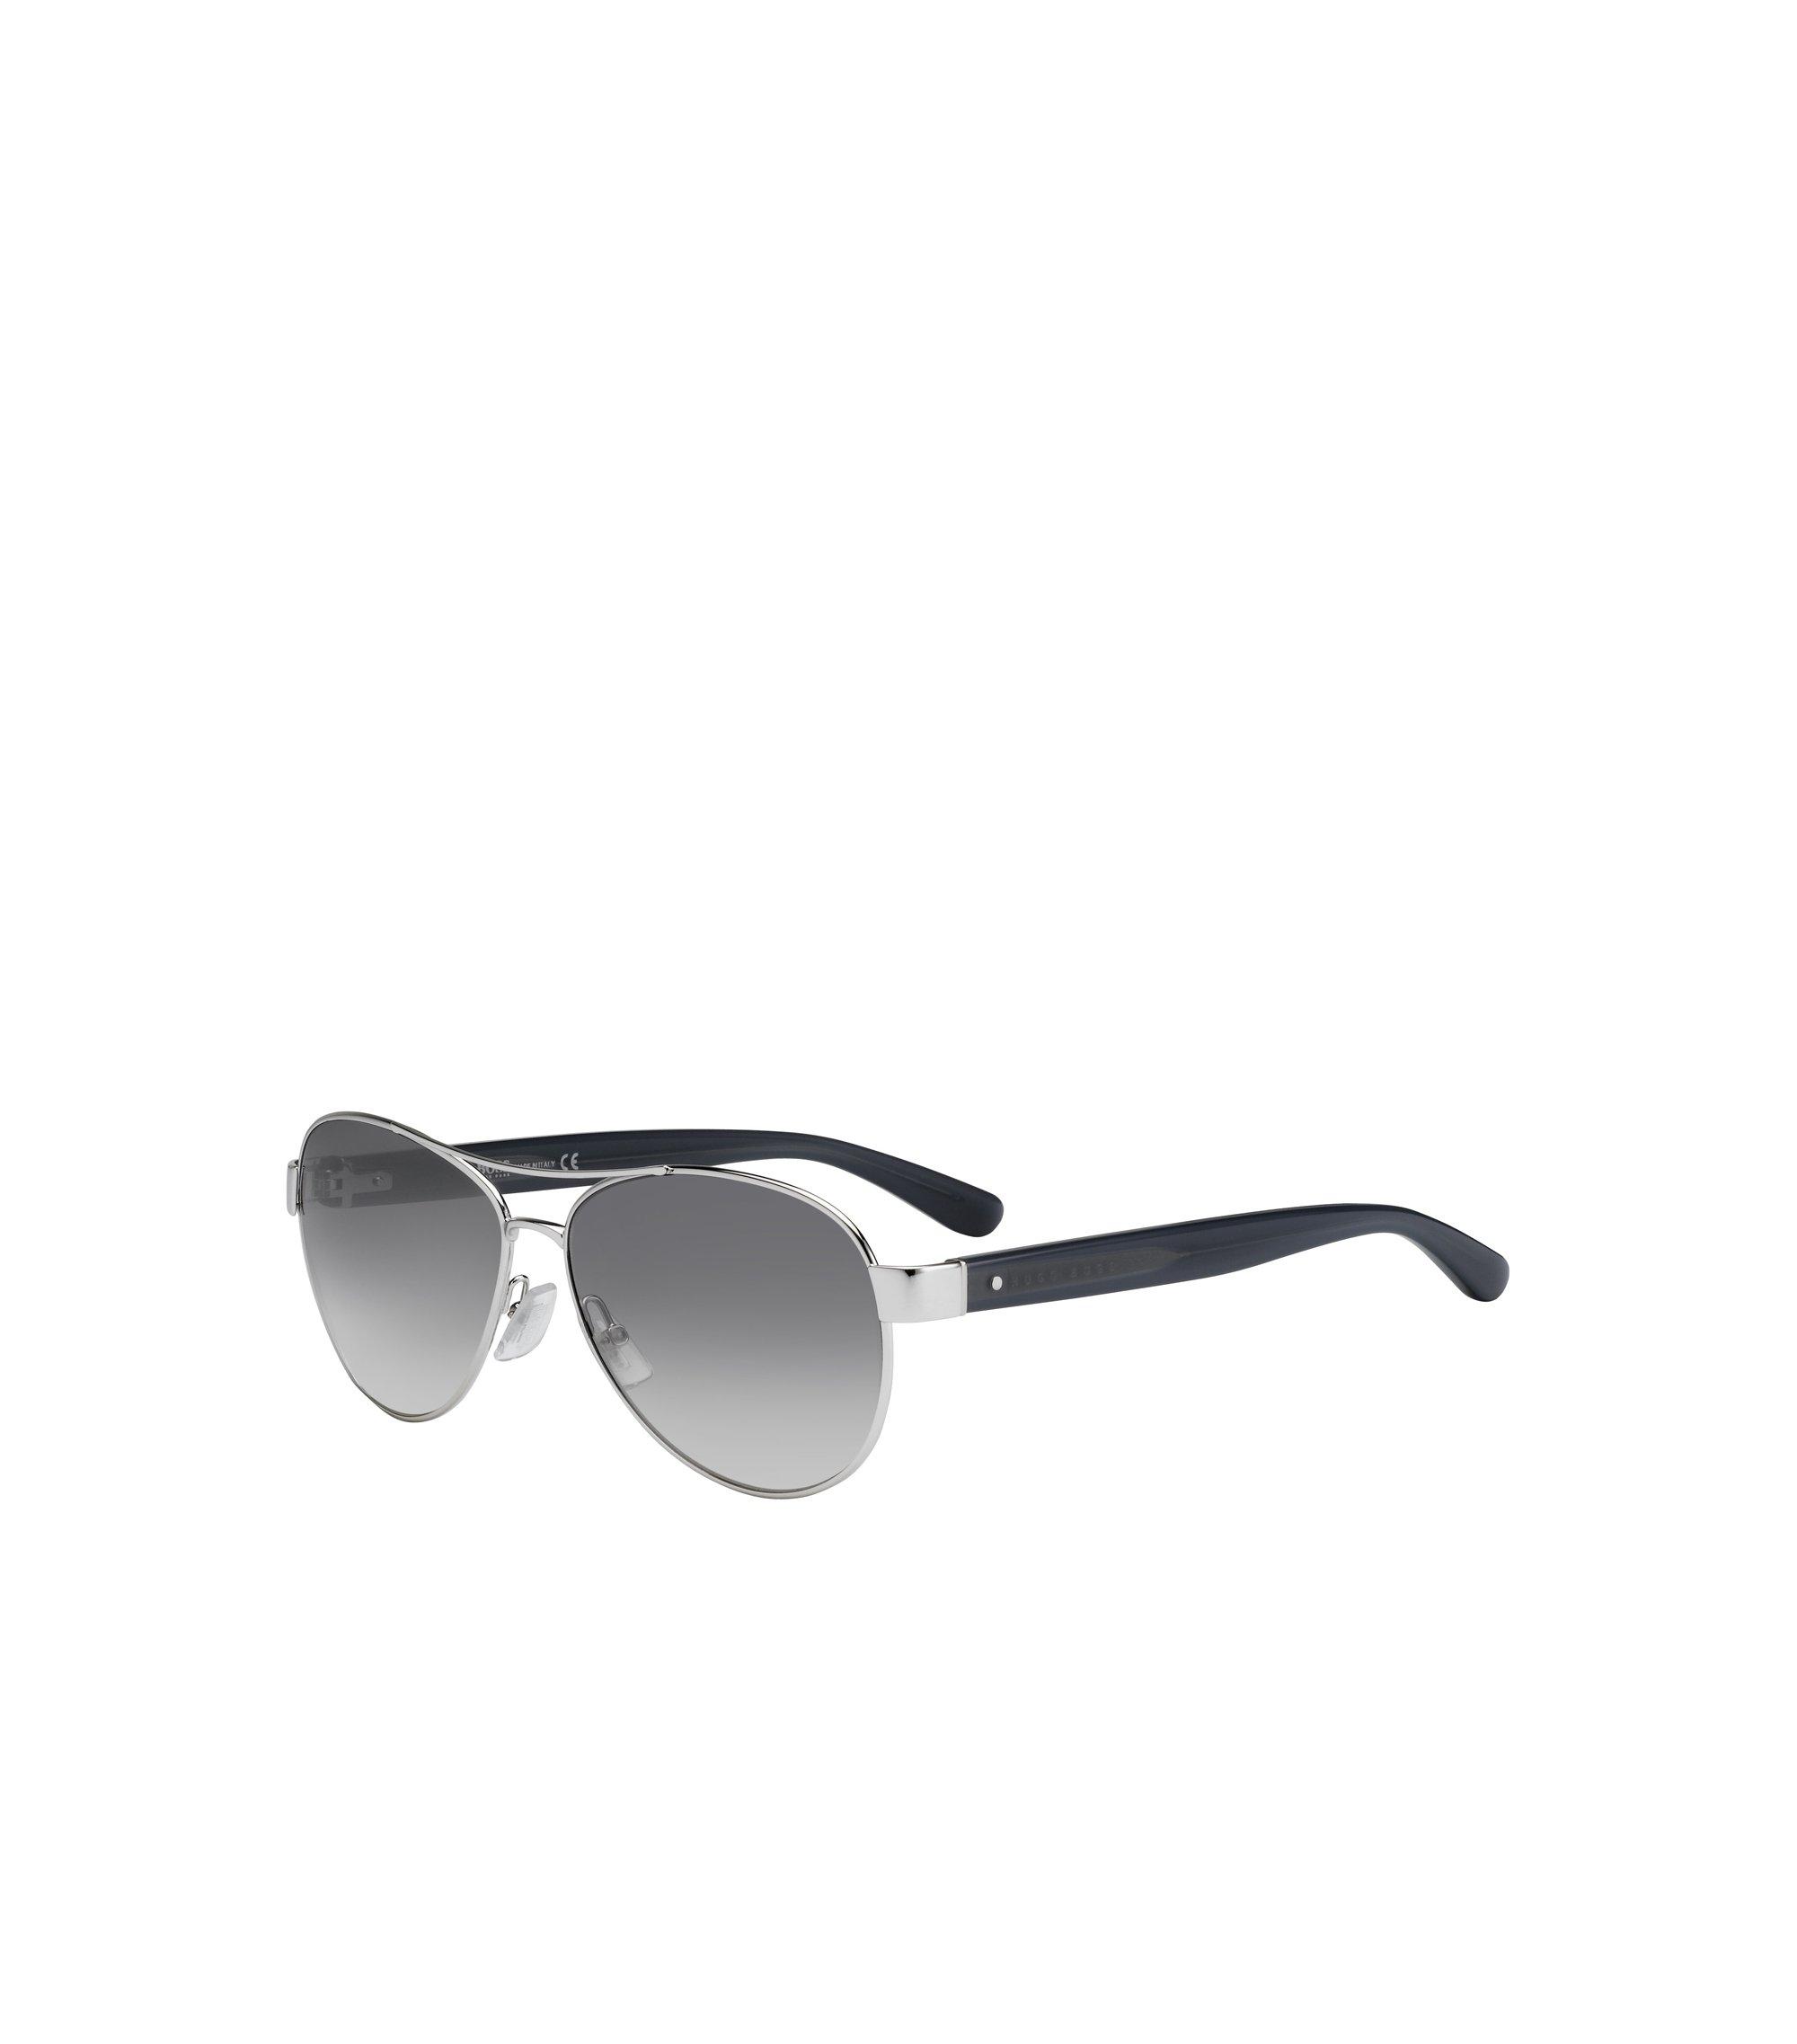 Mirror Lens Aviator Sunglasses | BOSS 0788S, Assorted-Pre-Pack